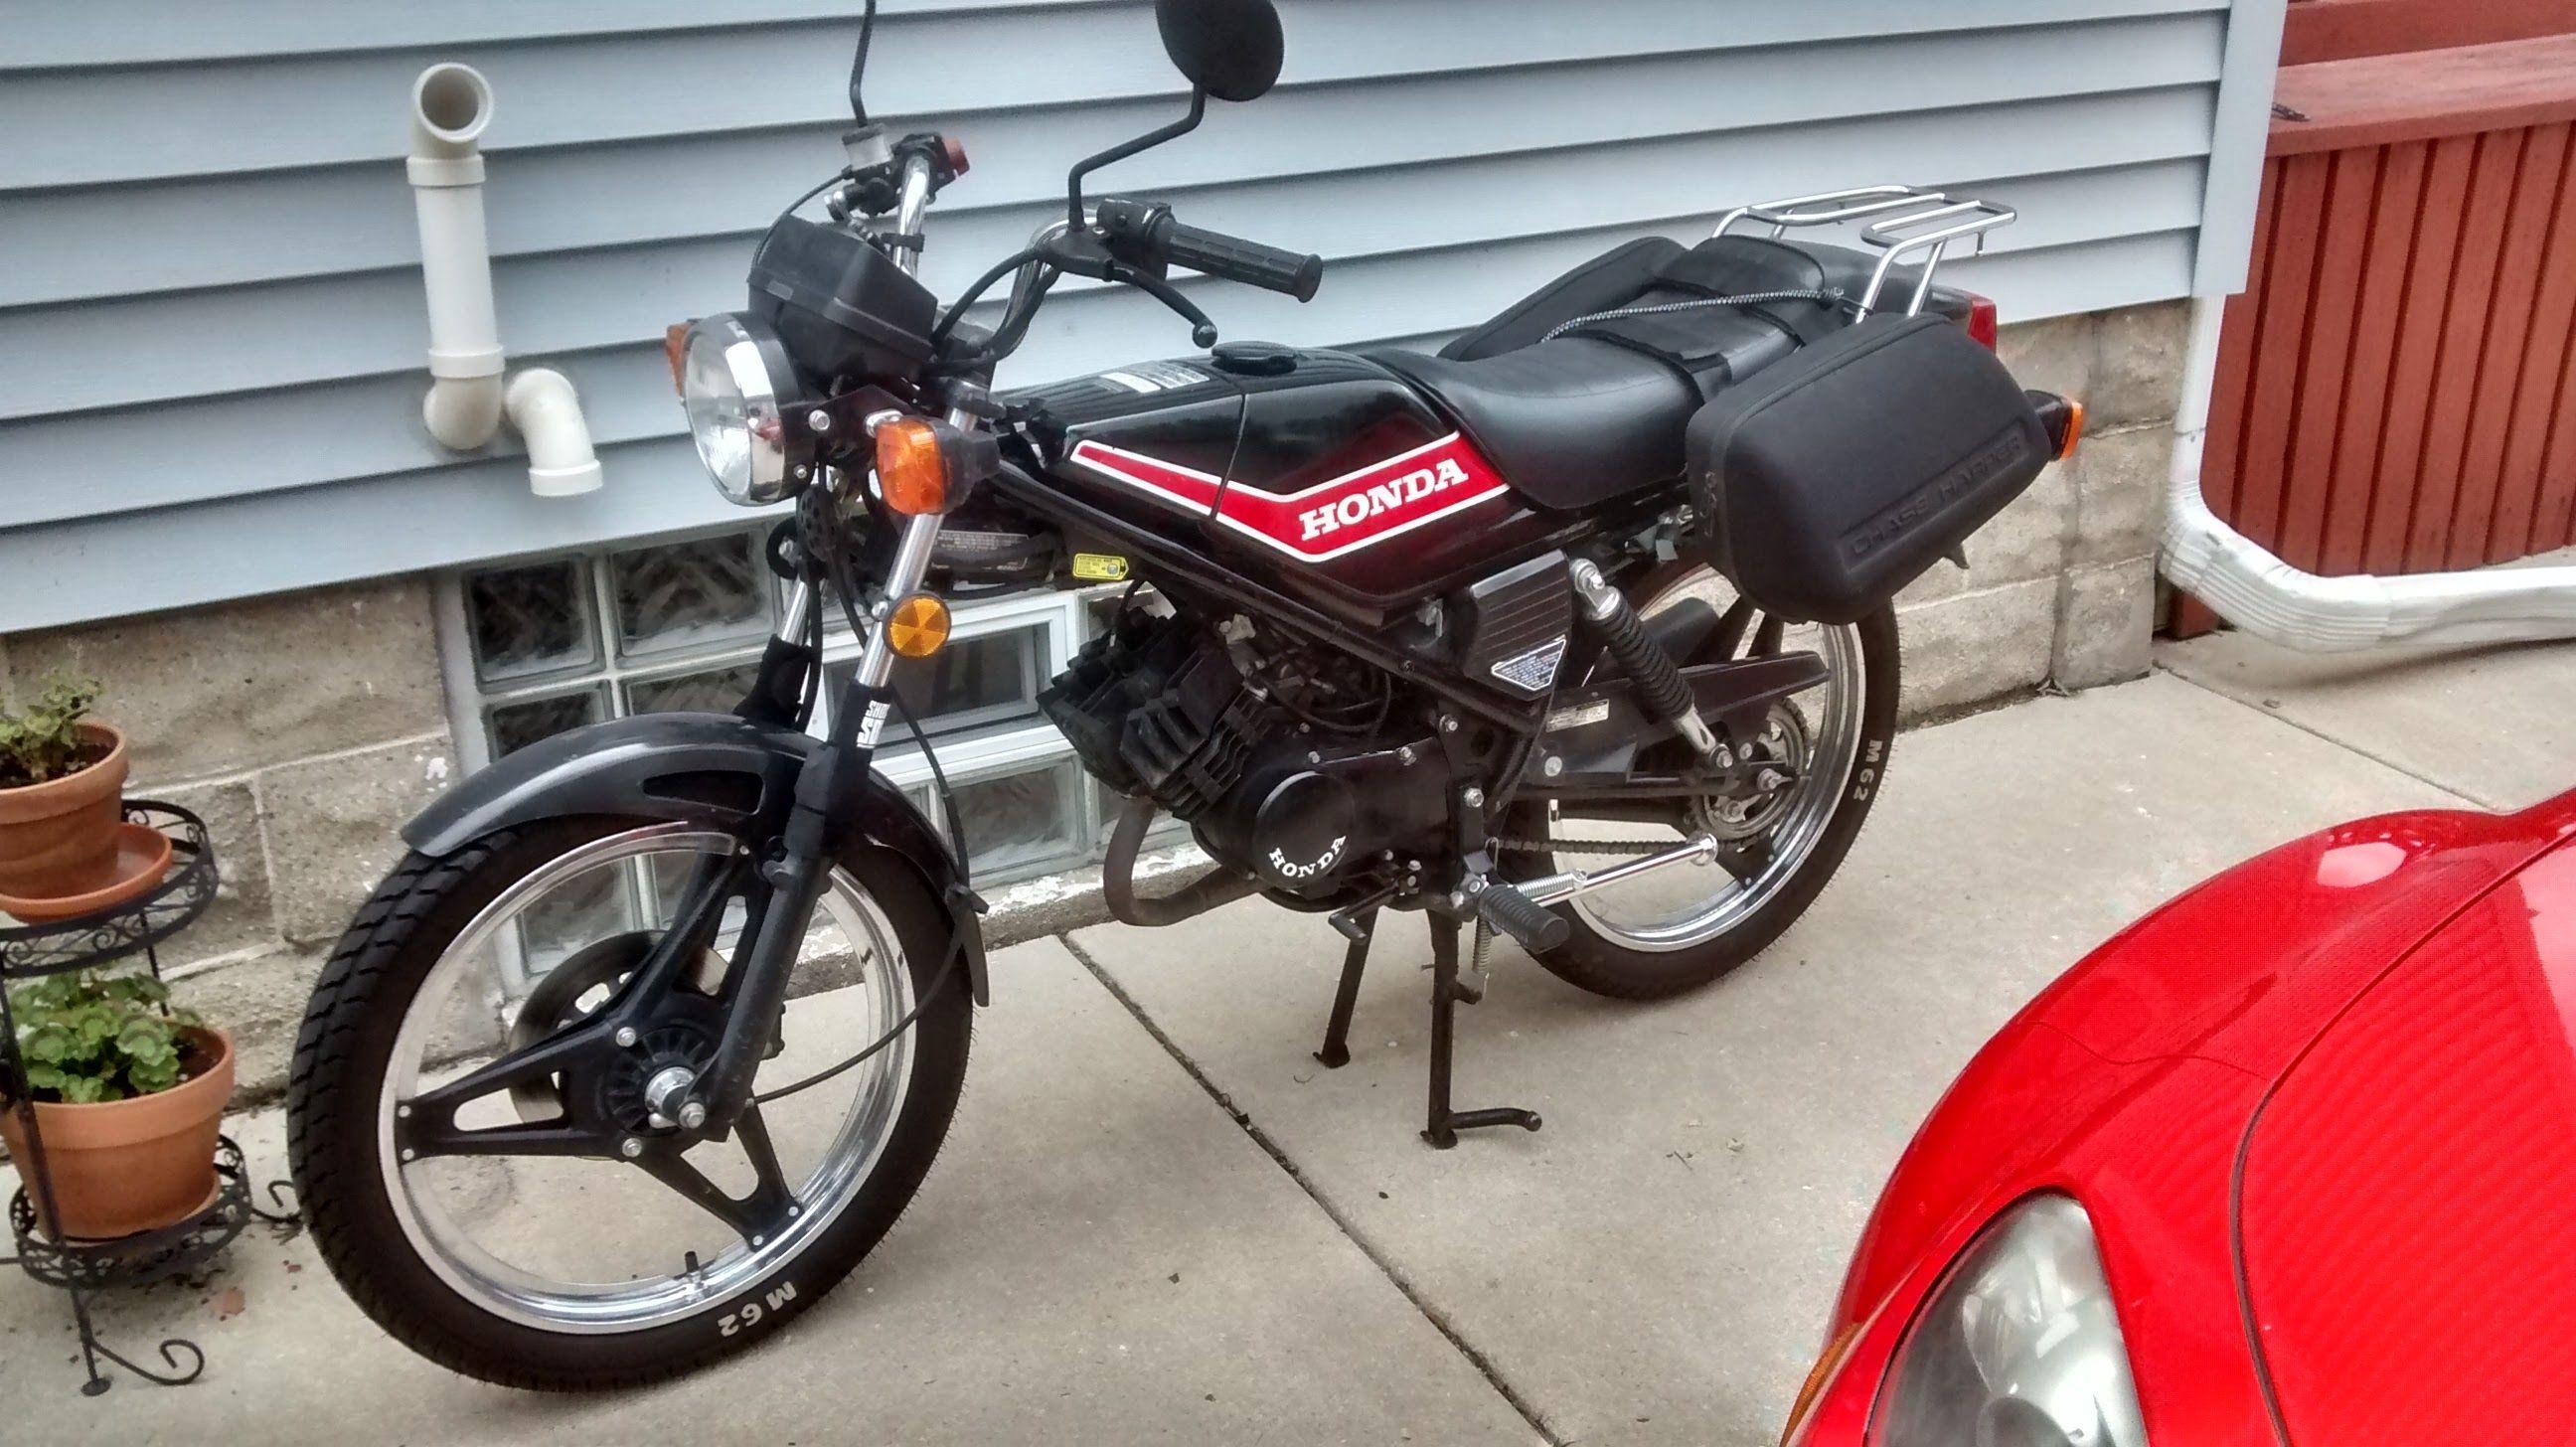 MB5 and saddlebags | The Honda MB5 | Pinterest | 50cc moped and Honda